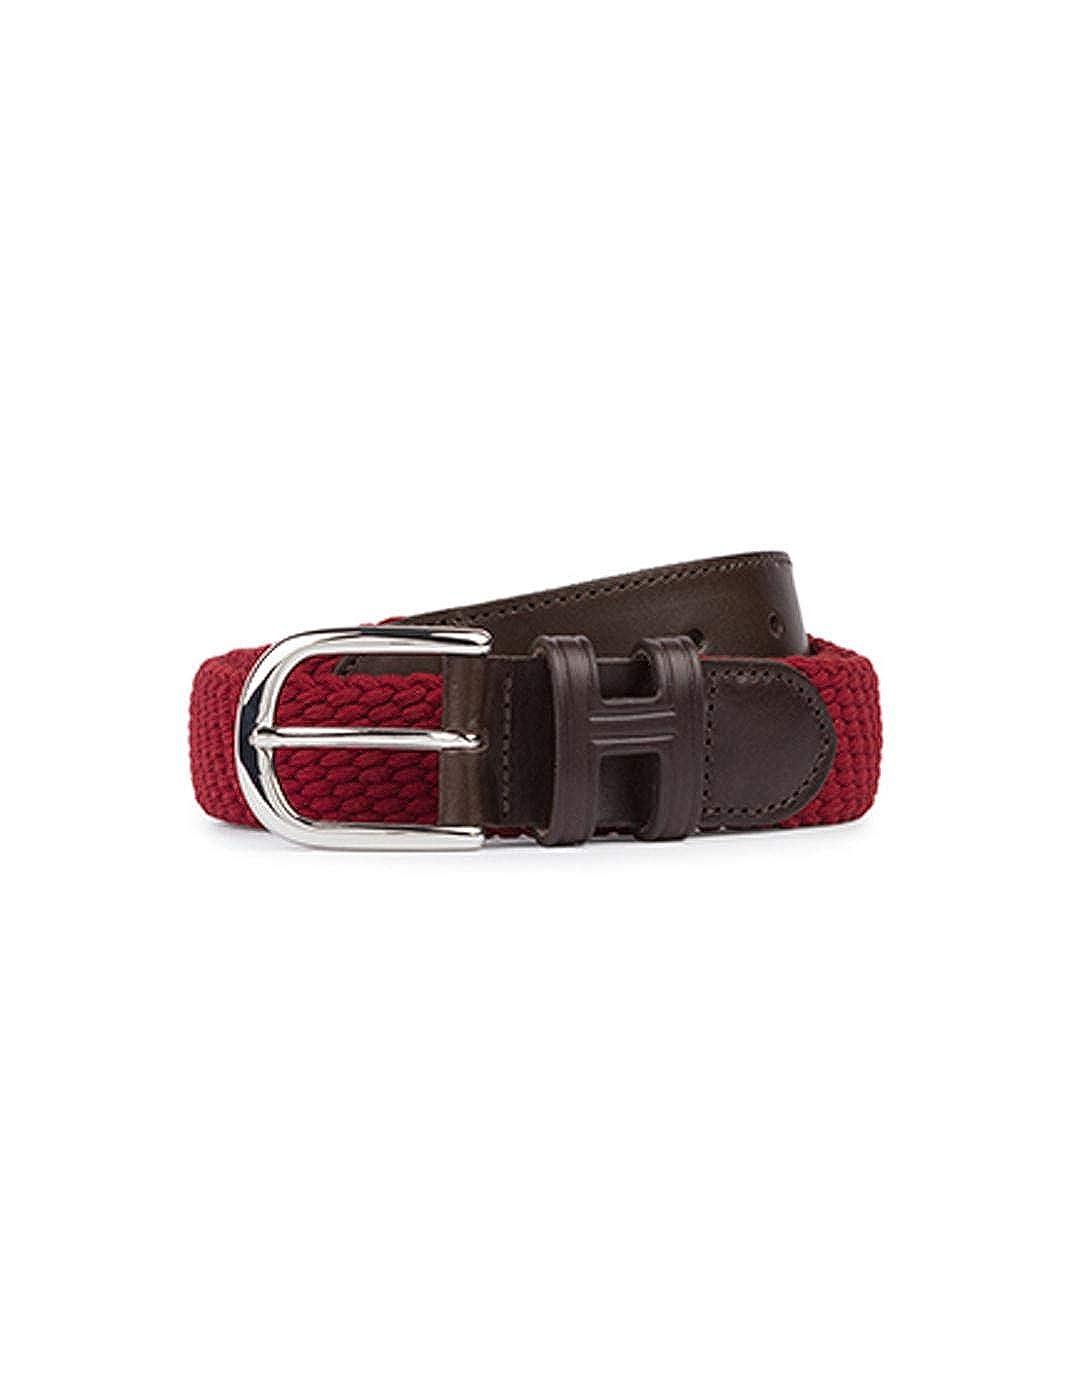 Hackett London Parachute Belt Cintur/ón para Hombre